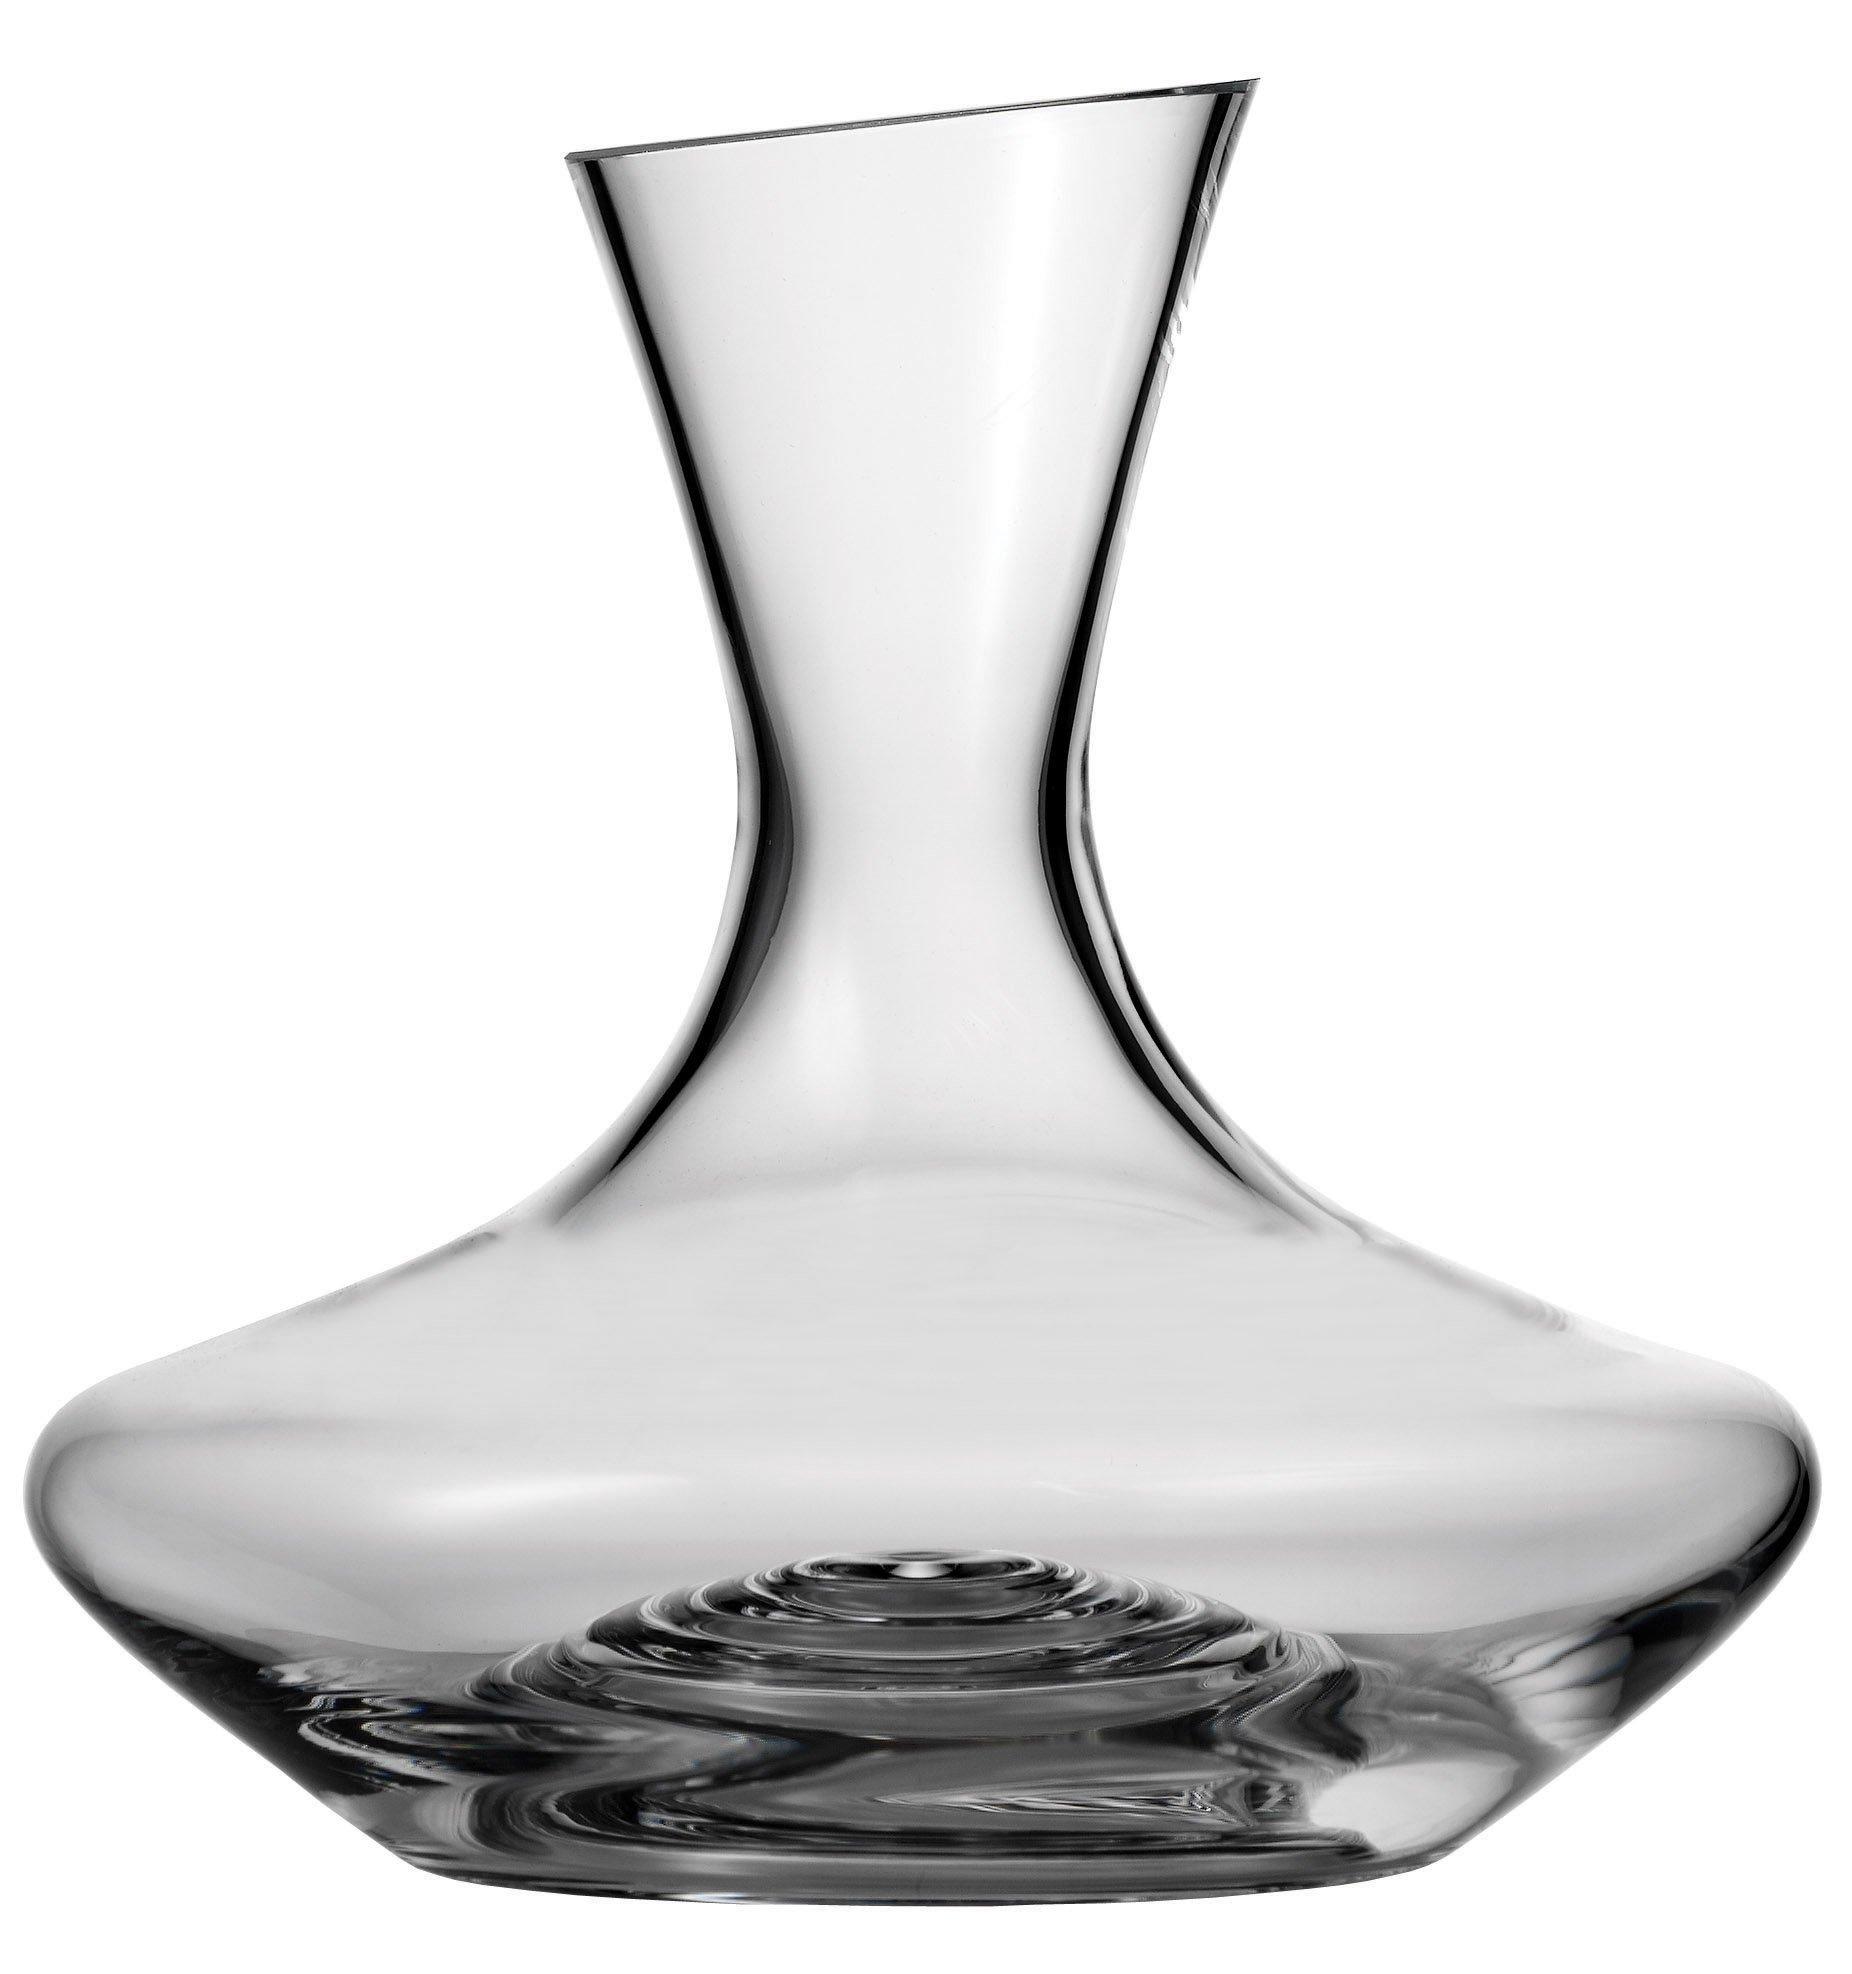 Zwiesel 1872 Handmade Glass  Pollux Decanter, 1-Liter